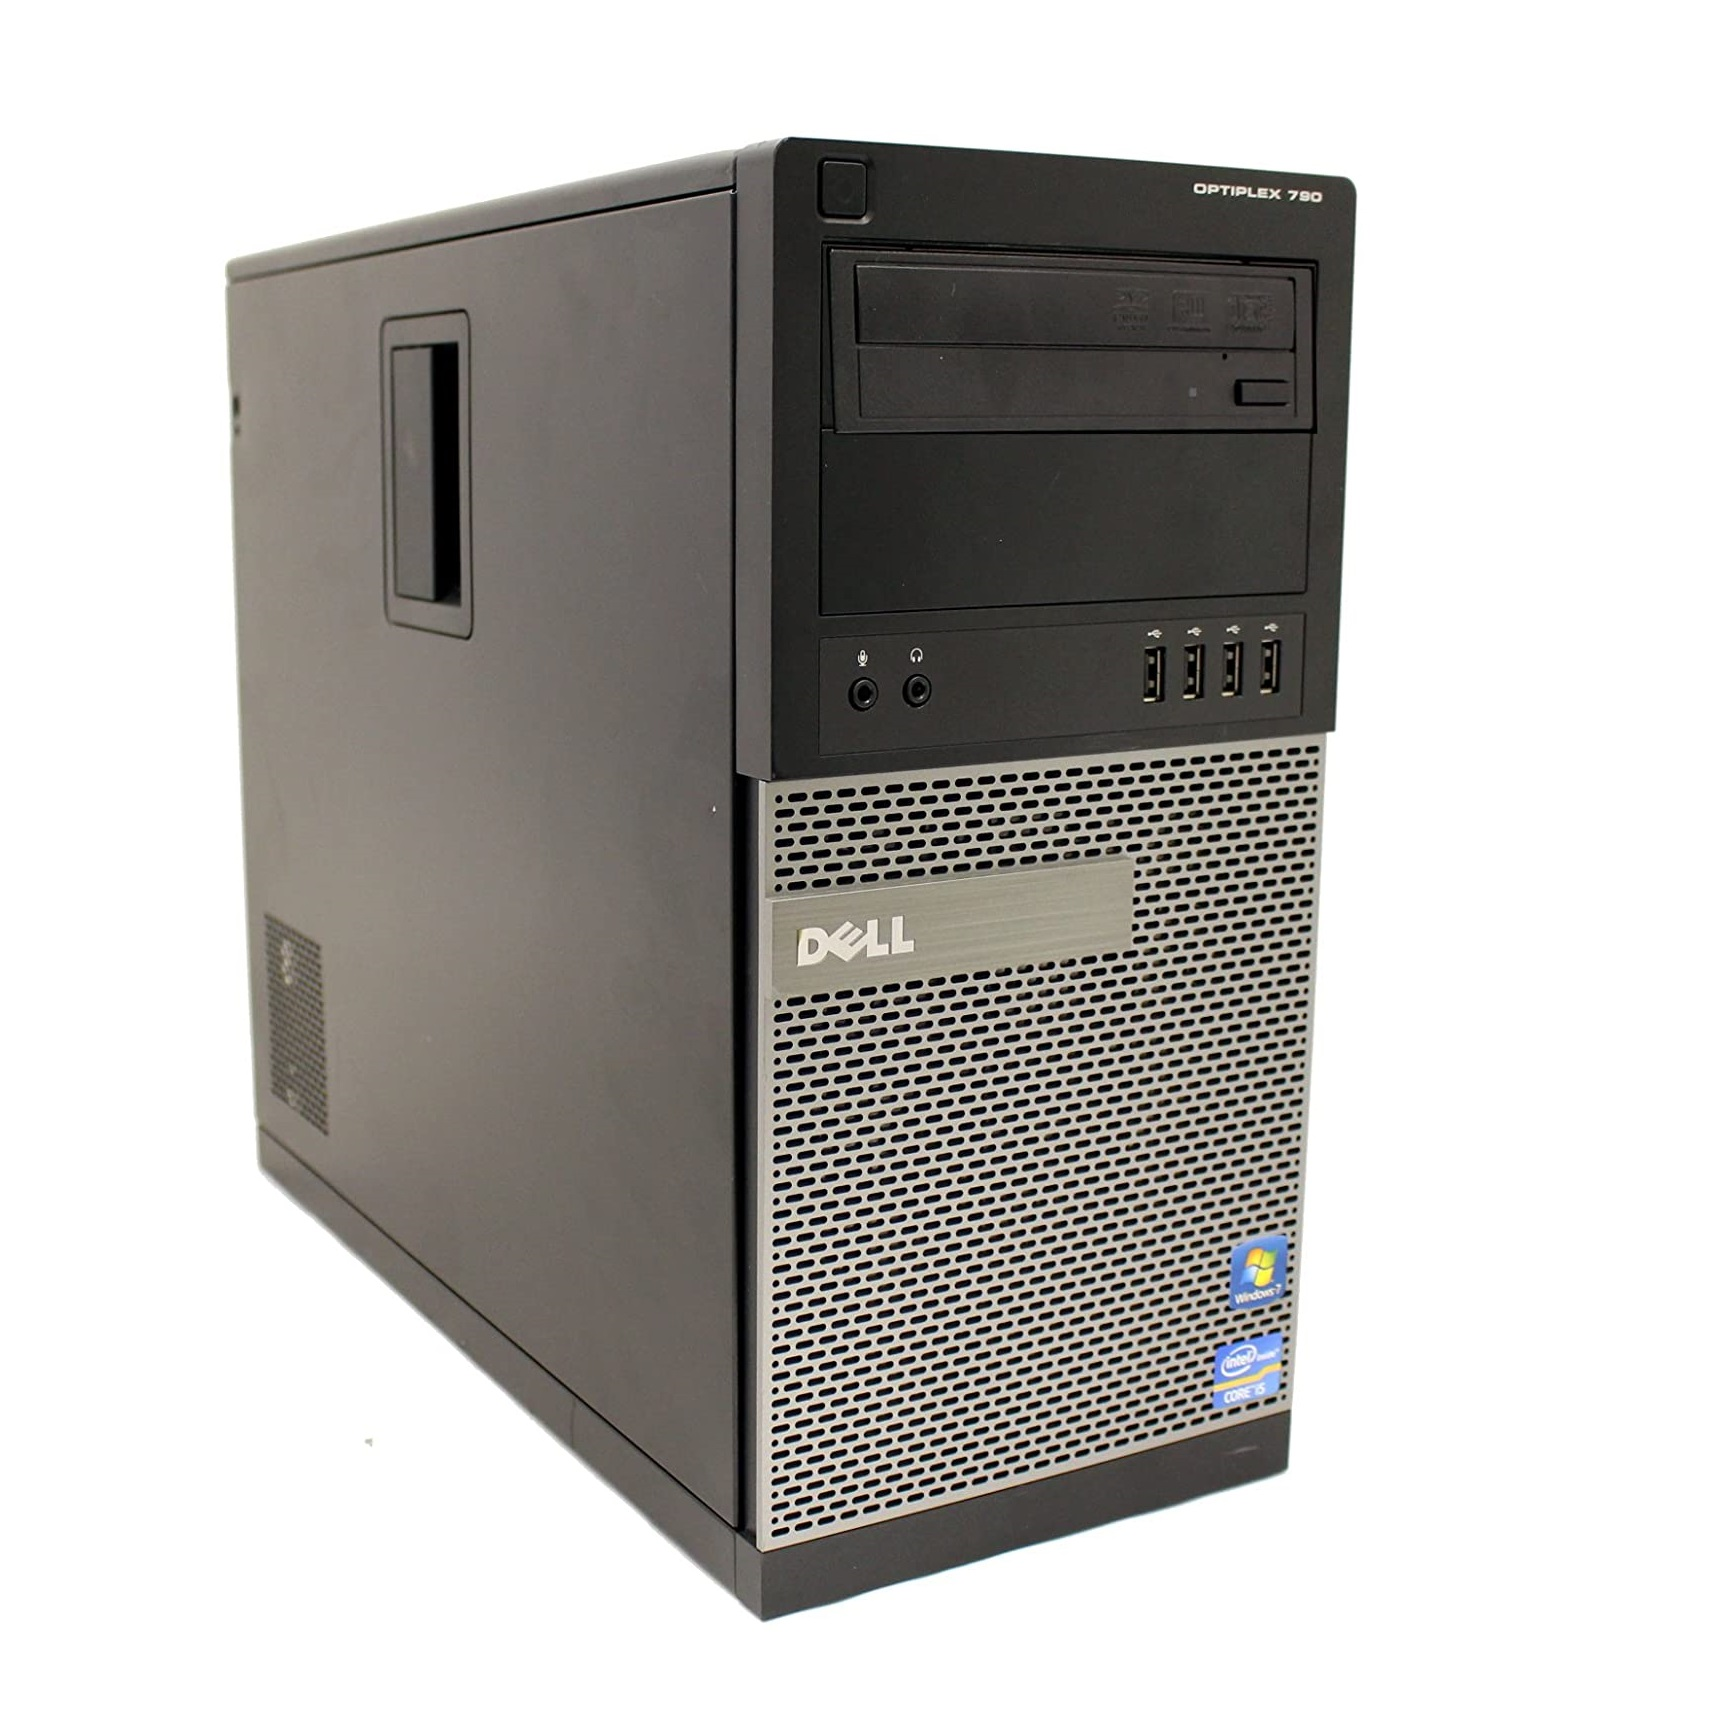 Компютър DELL OptiPlex 790 i3-2120/6GB/250GB/DVD